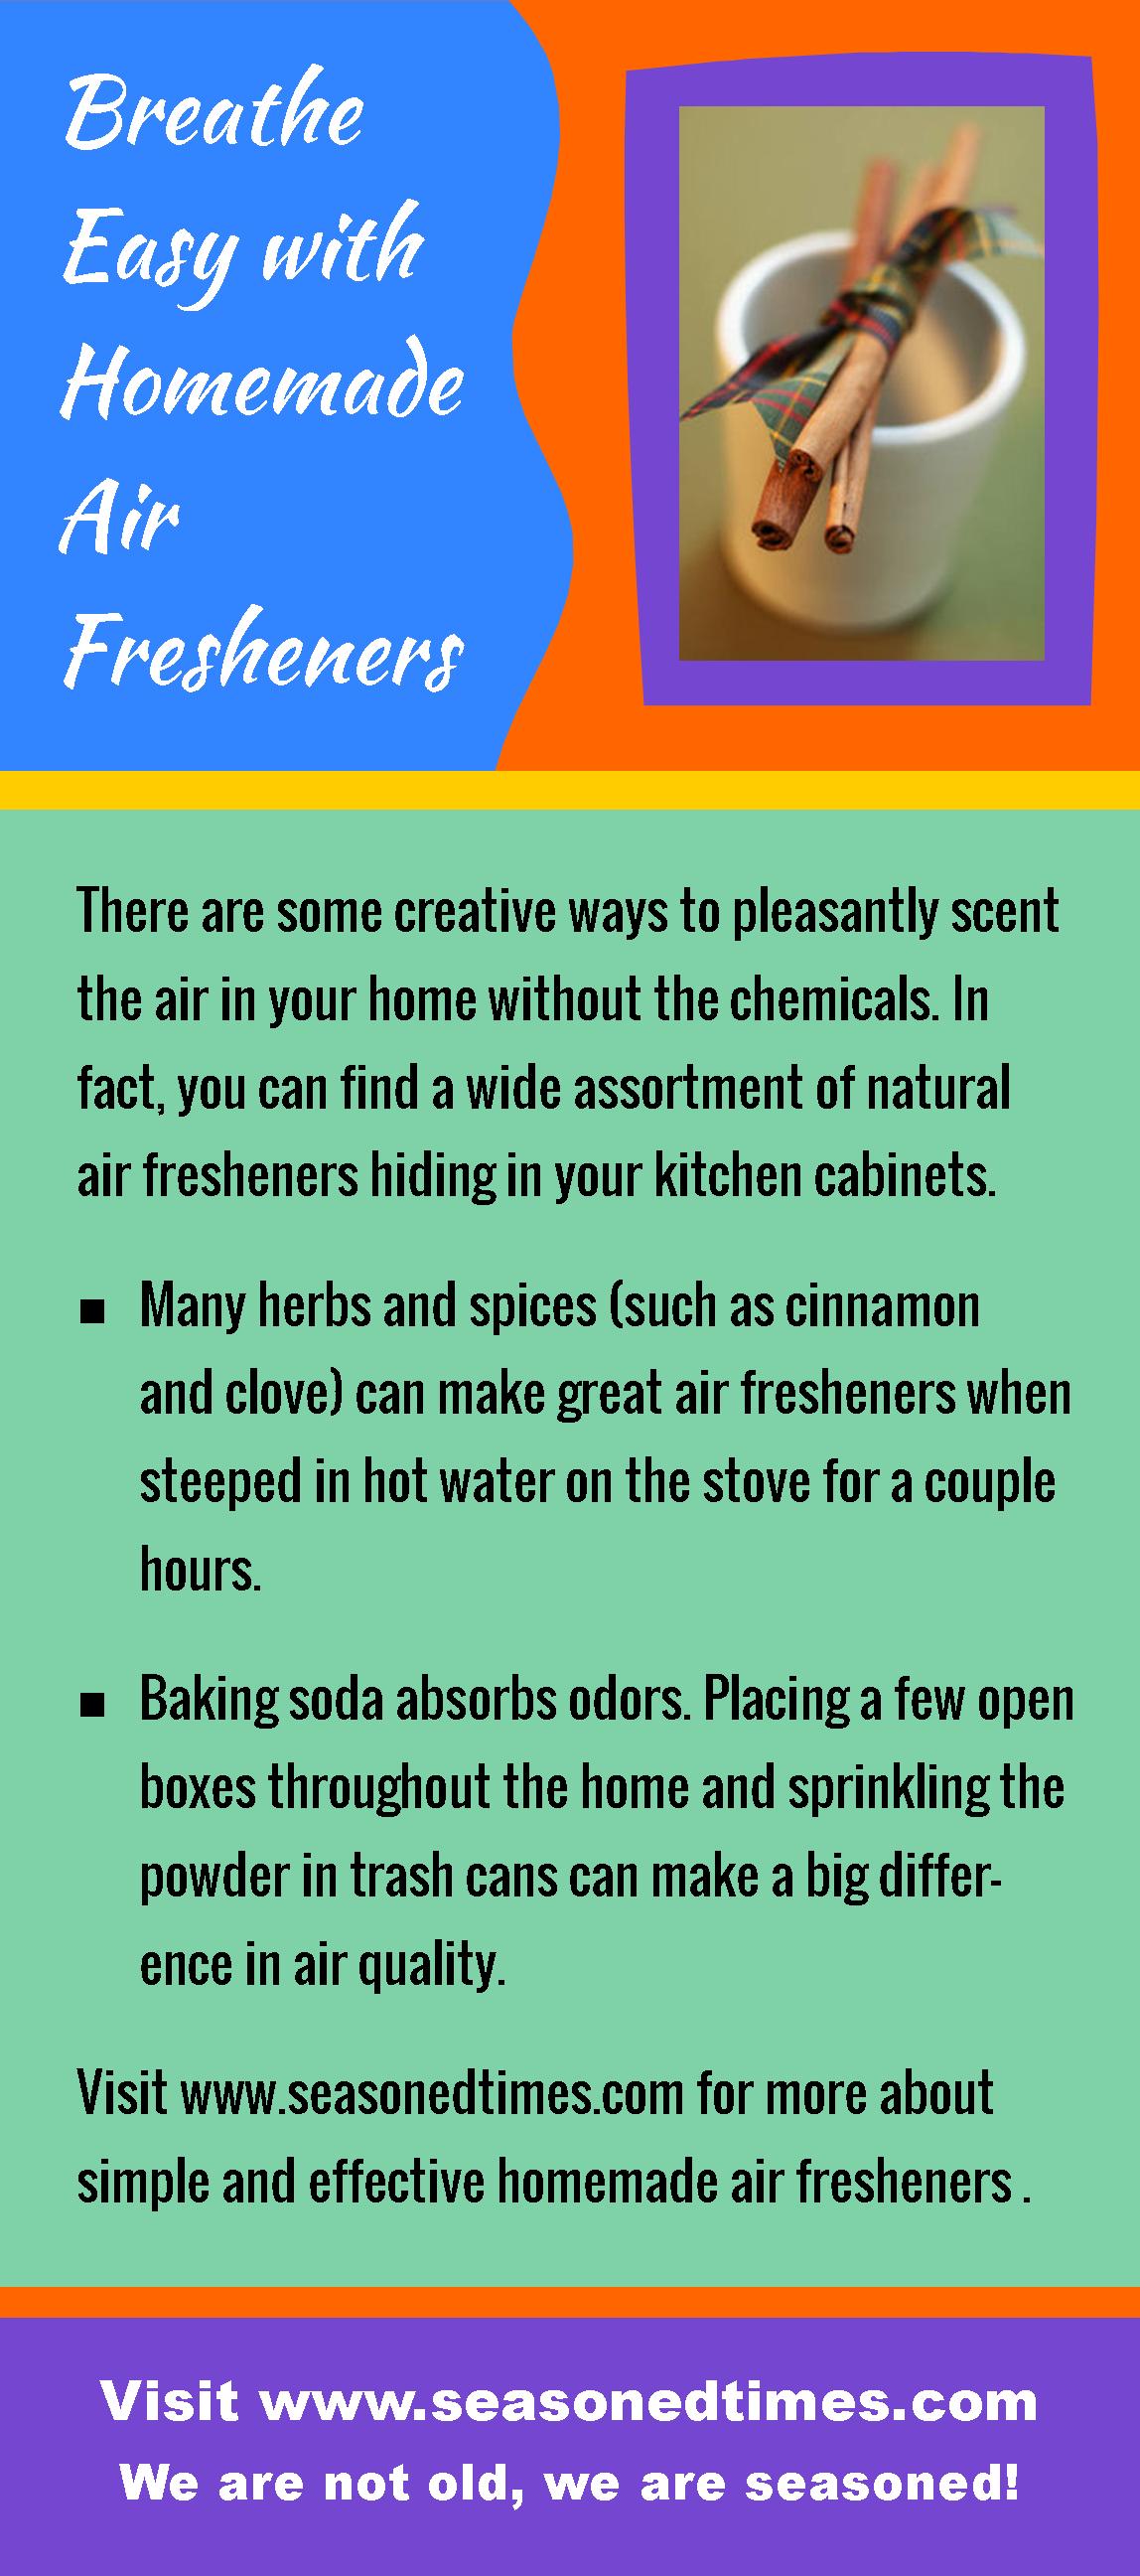 Breathe Easy with Homemade Air Fresheners. Seasoned Times